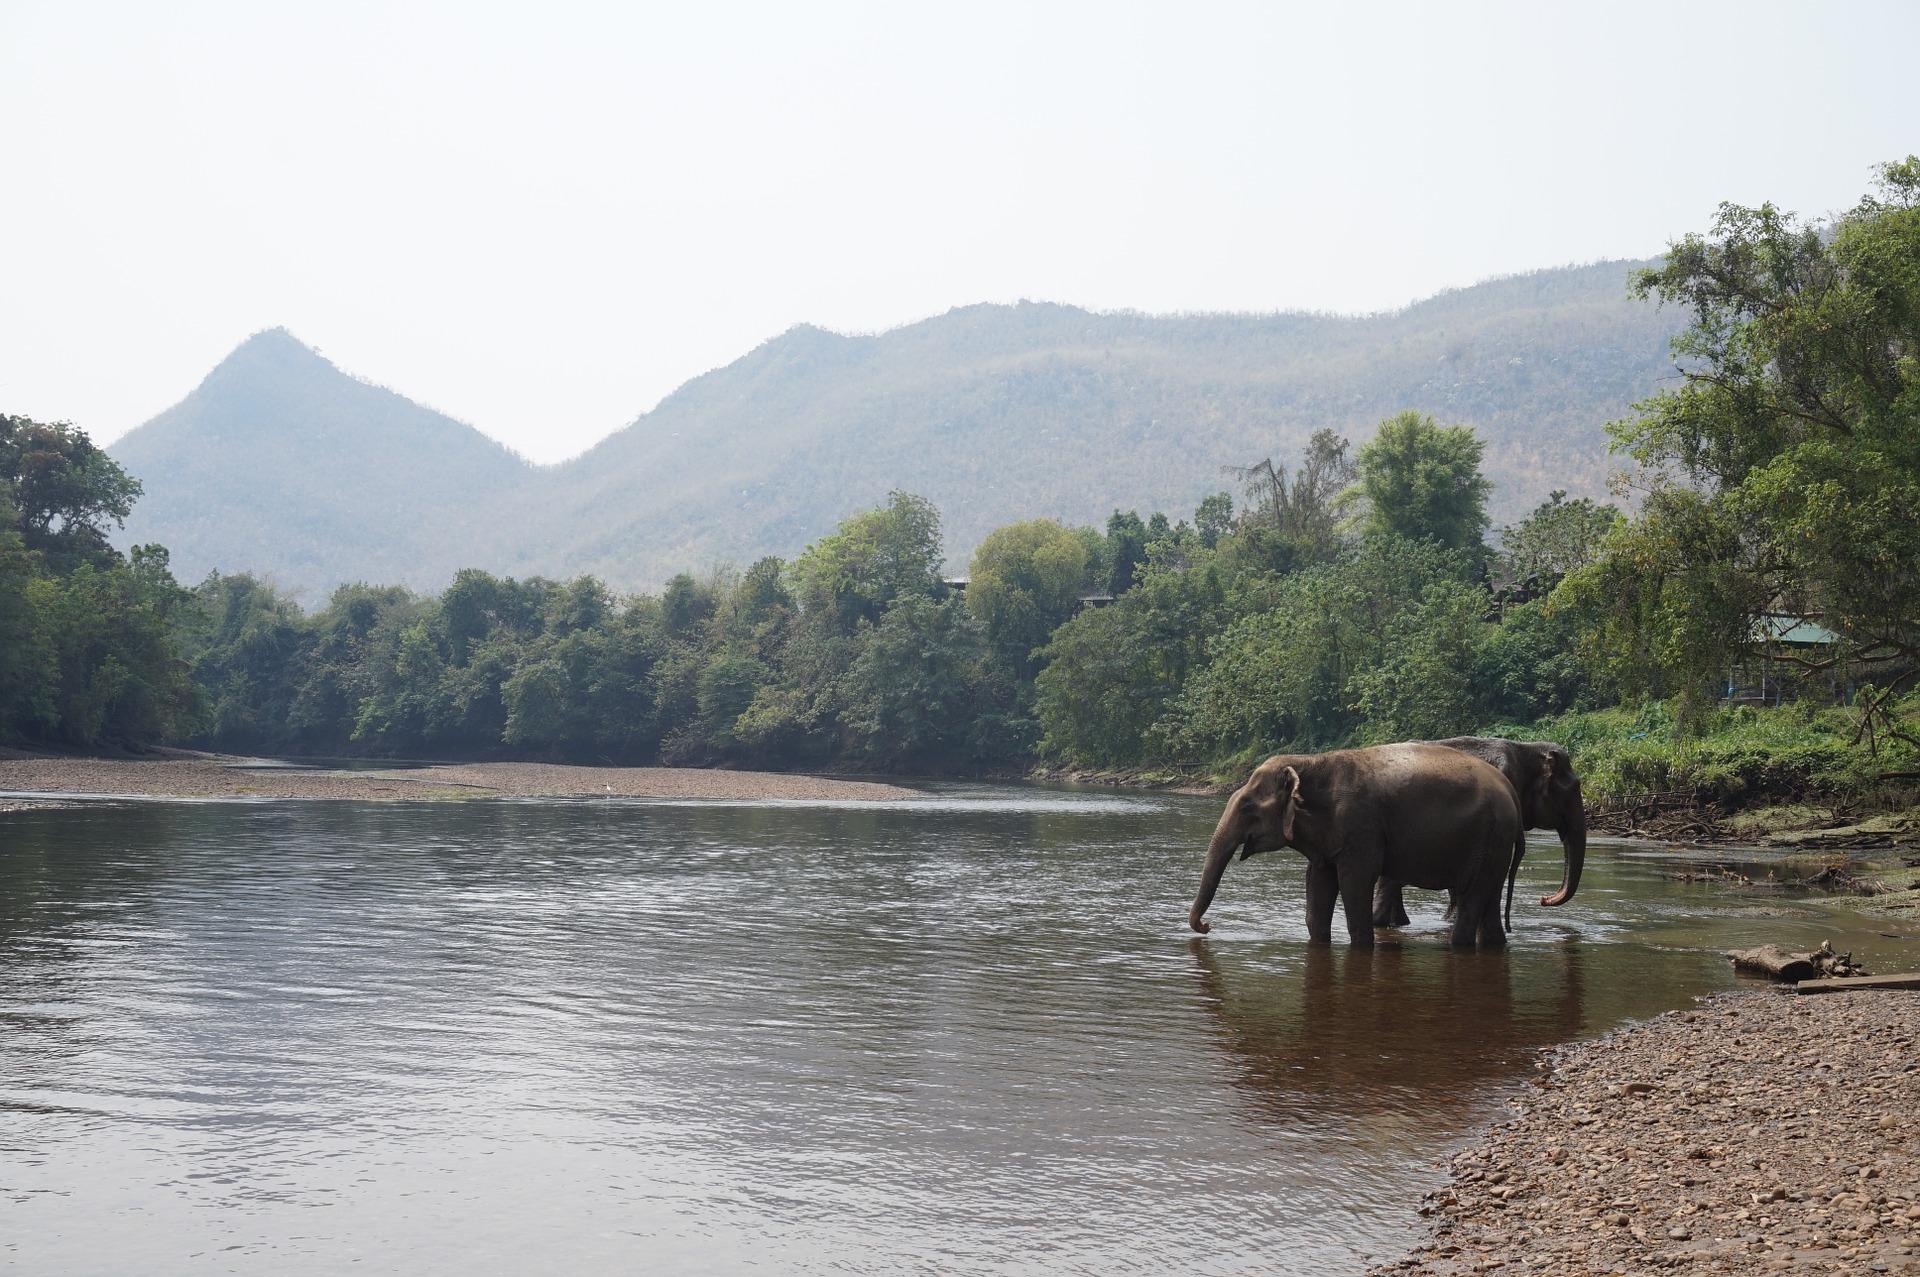 Thai Elephant In a River